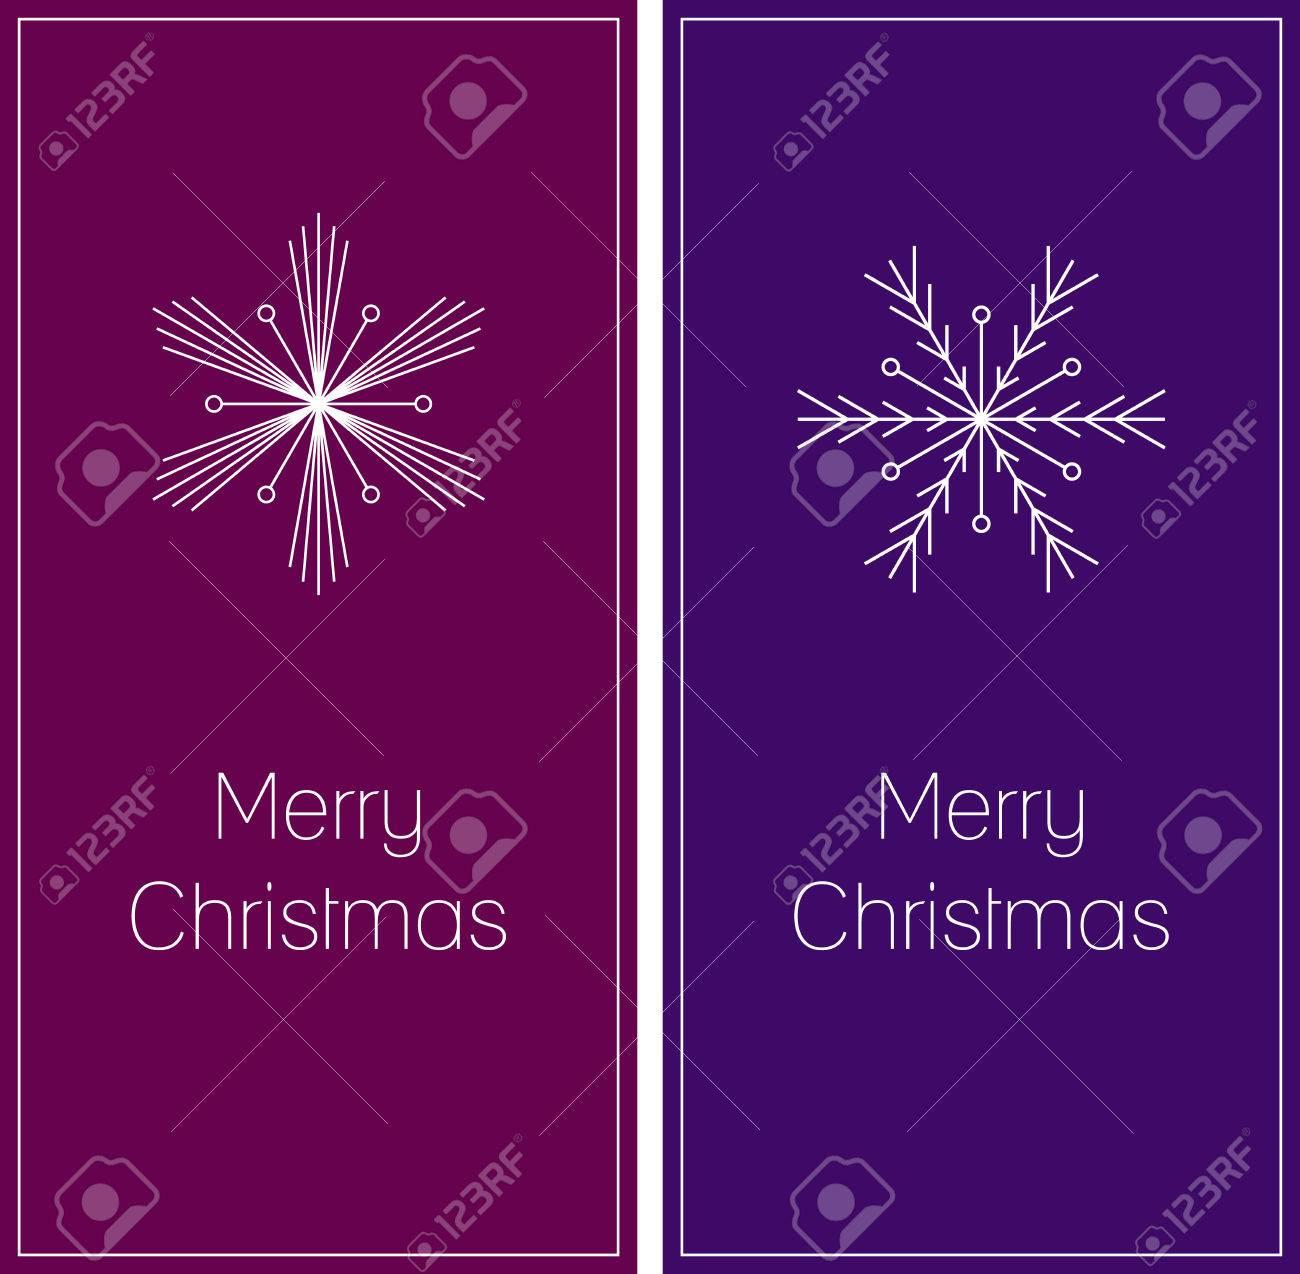 Minimalistic set of two christmas greeting cards with snowflake minimalistic set of two christmas greeting cards with snowflake and text merry christmas on dark m4hsunfo